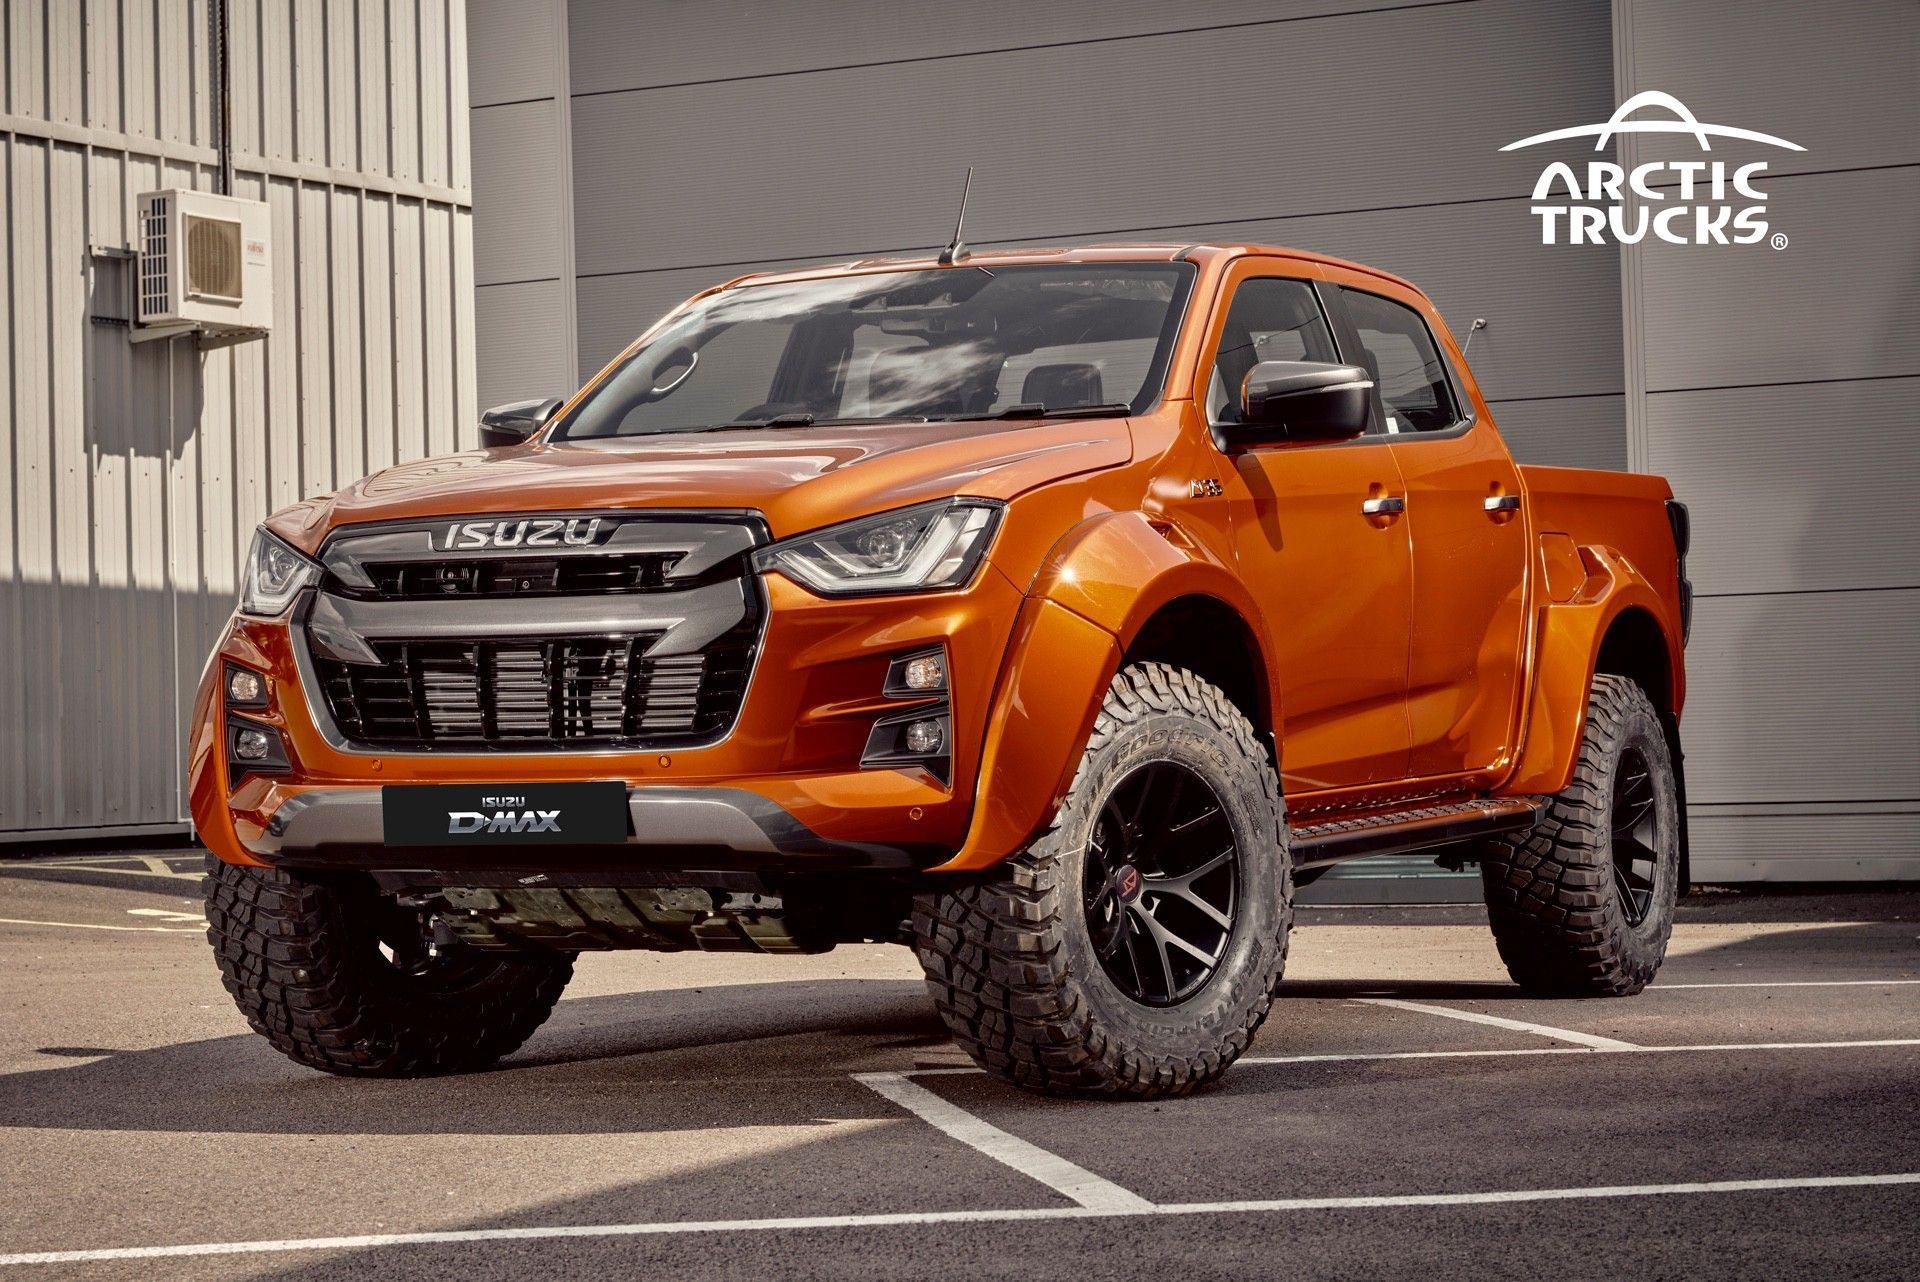 2022_Isuzu_D-Max_Arctic_Trucks_AT35-0001